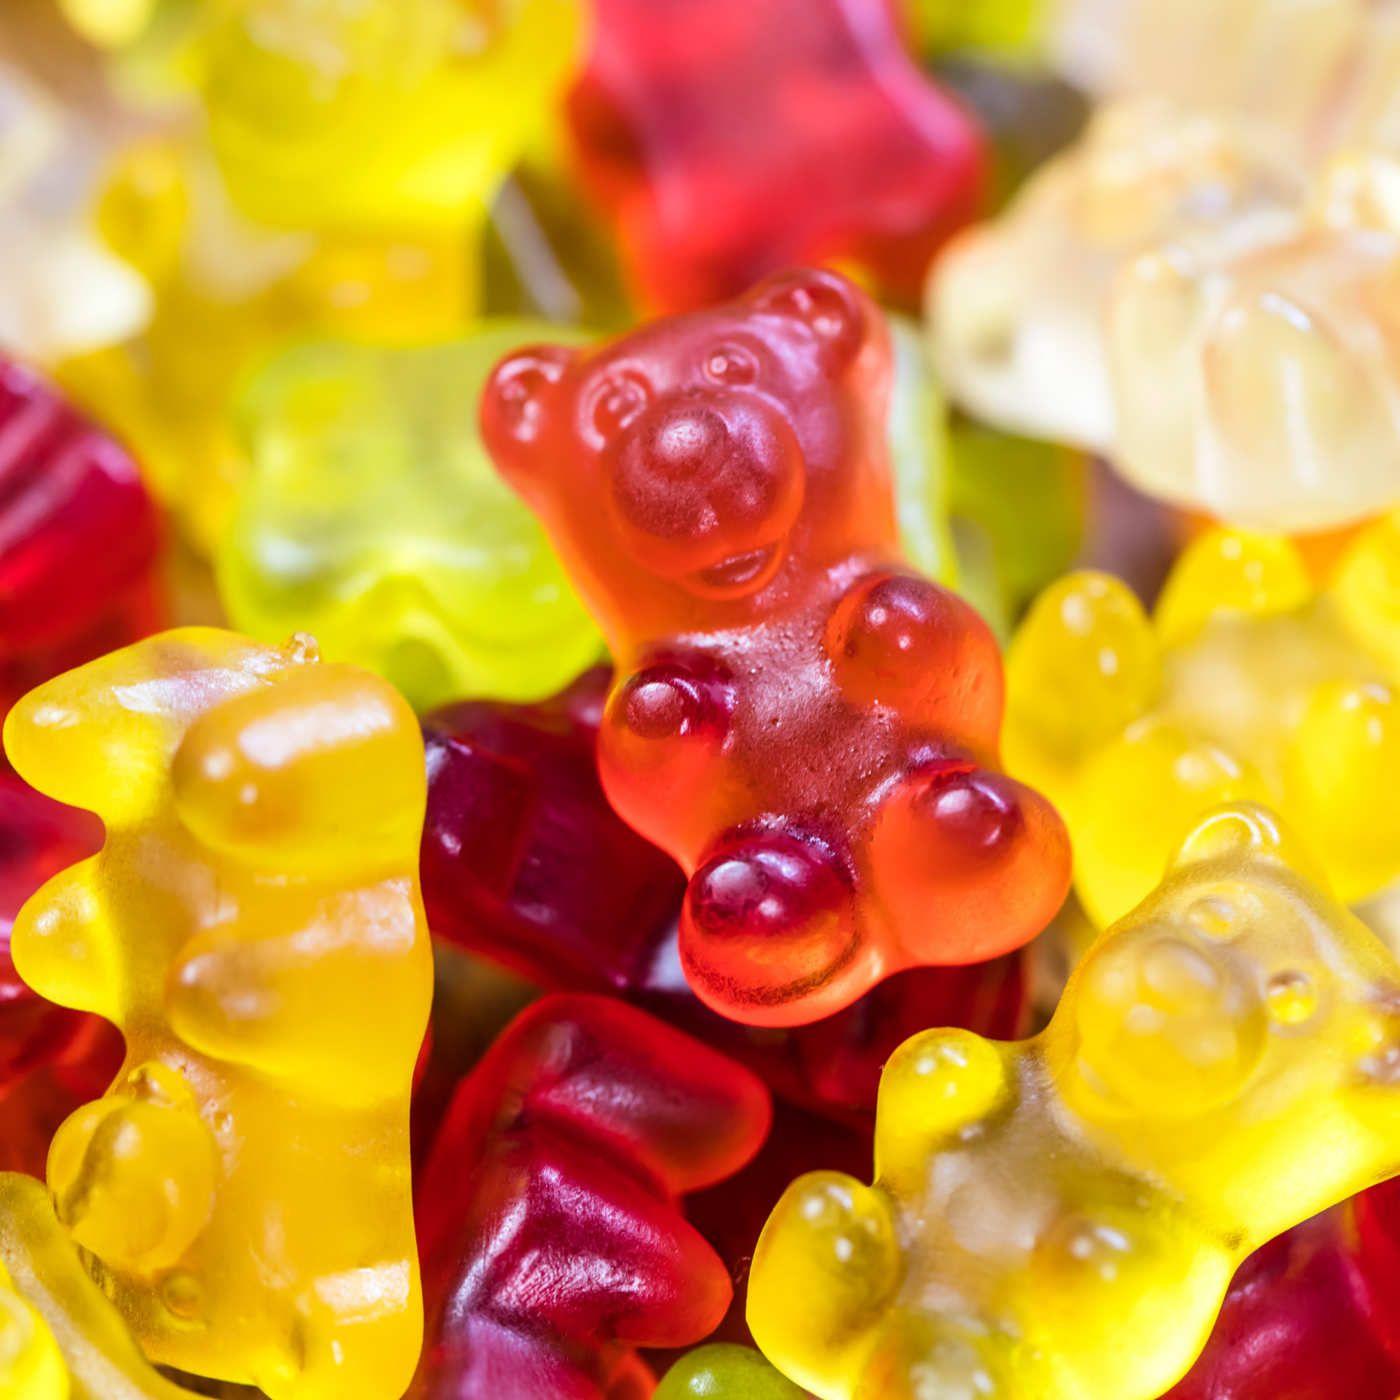 7 Gelatin Free Gummies To Try If You Re Looking For Ethical Gummy Bears Gummy Bears Vegan Gummy Bears Haribo Gummy Bears